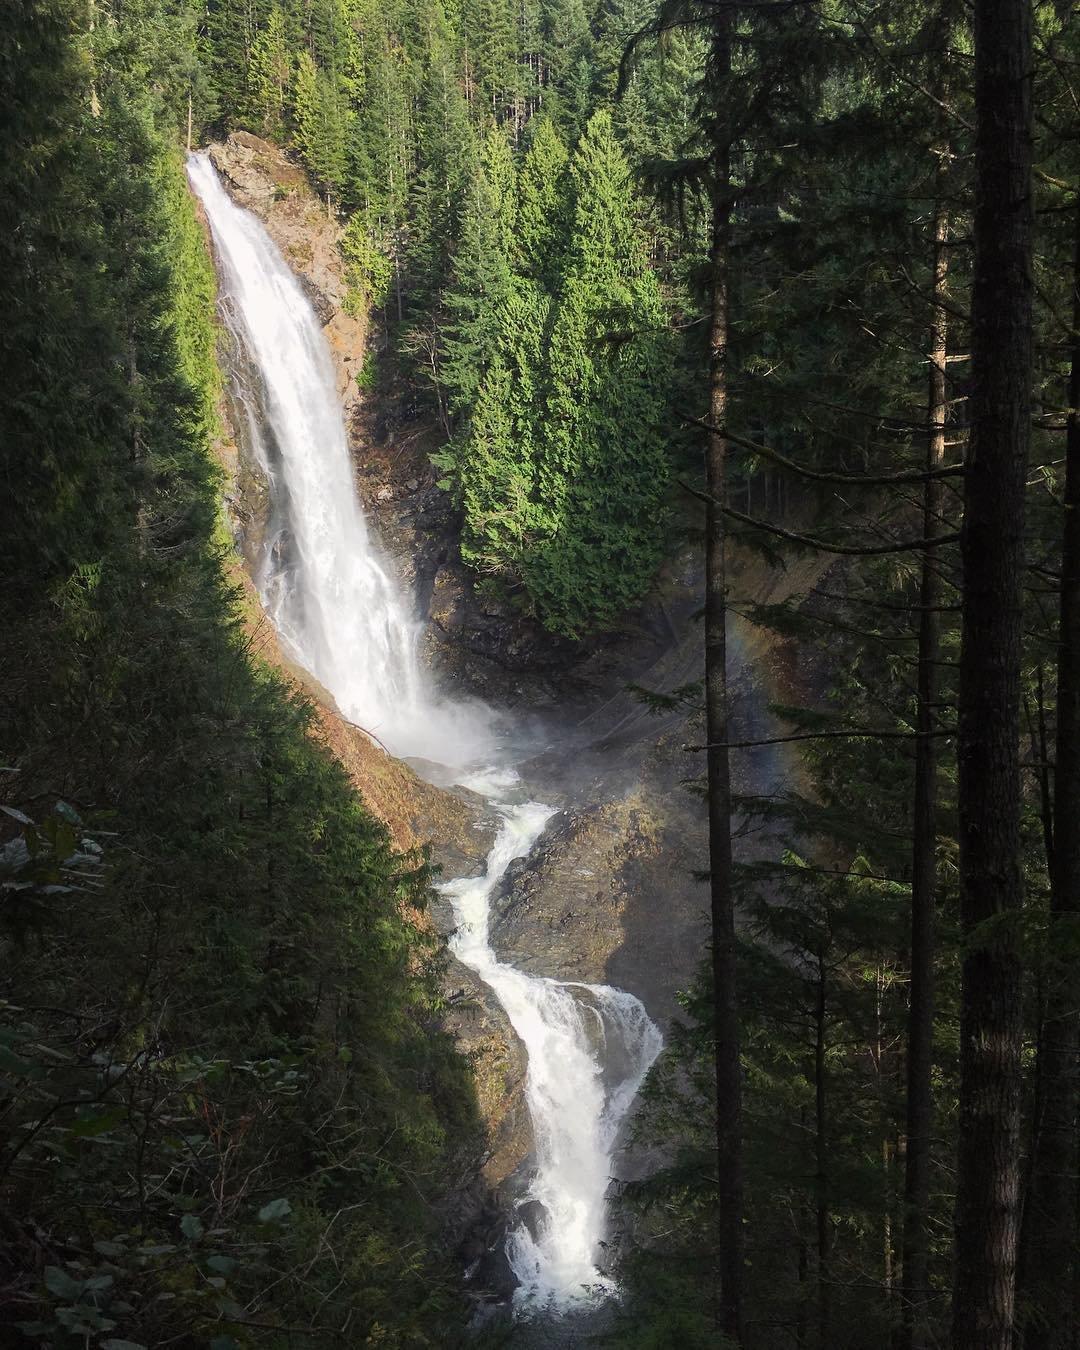 Large waterfall surrounded by trees at Wallace Falls near Bothell, Washington.